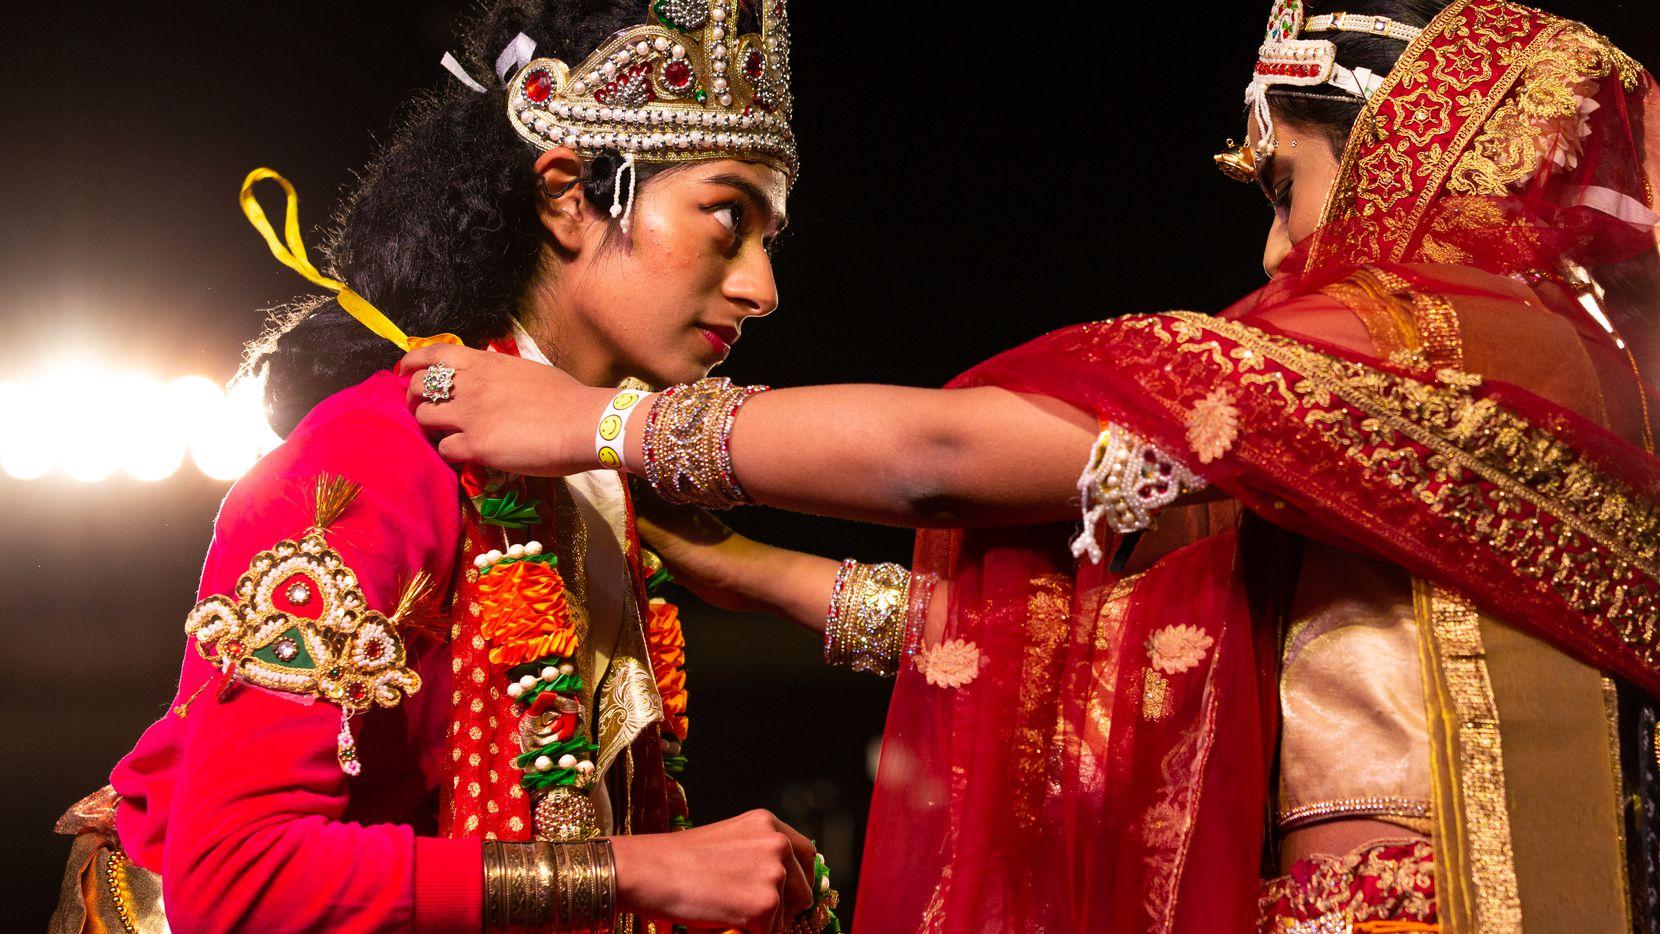 Sixteen-year-old Sanjana Shangle performs Saturday in the Ramlila, a musical drama and dance production that depicts Hindu mythology during Diwali Mela at Fair Park in Dallas.